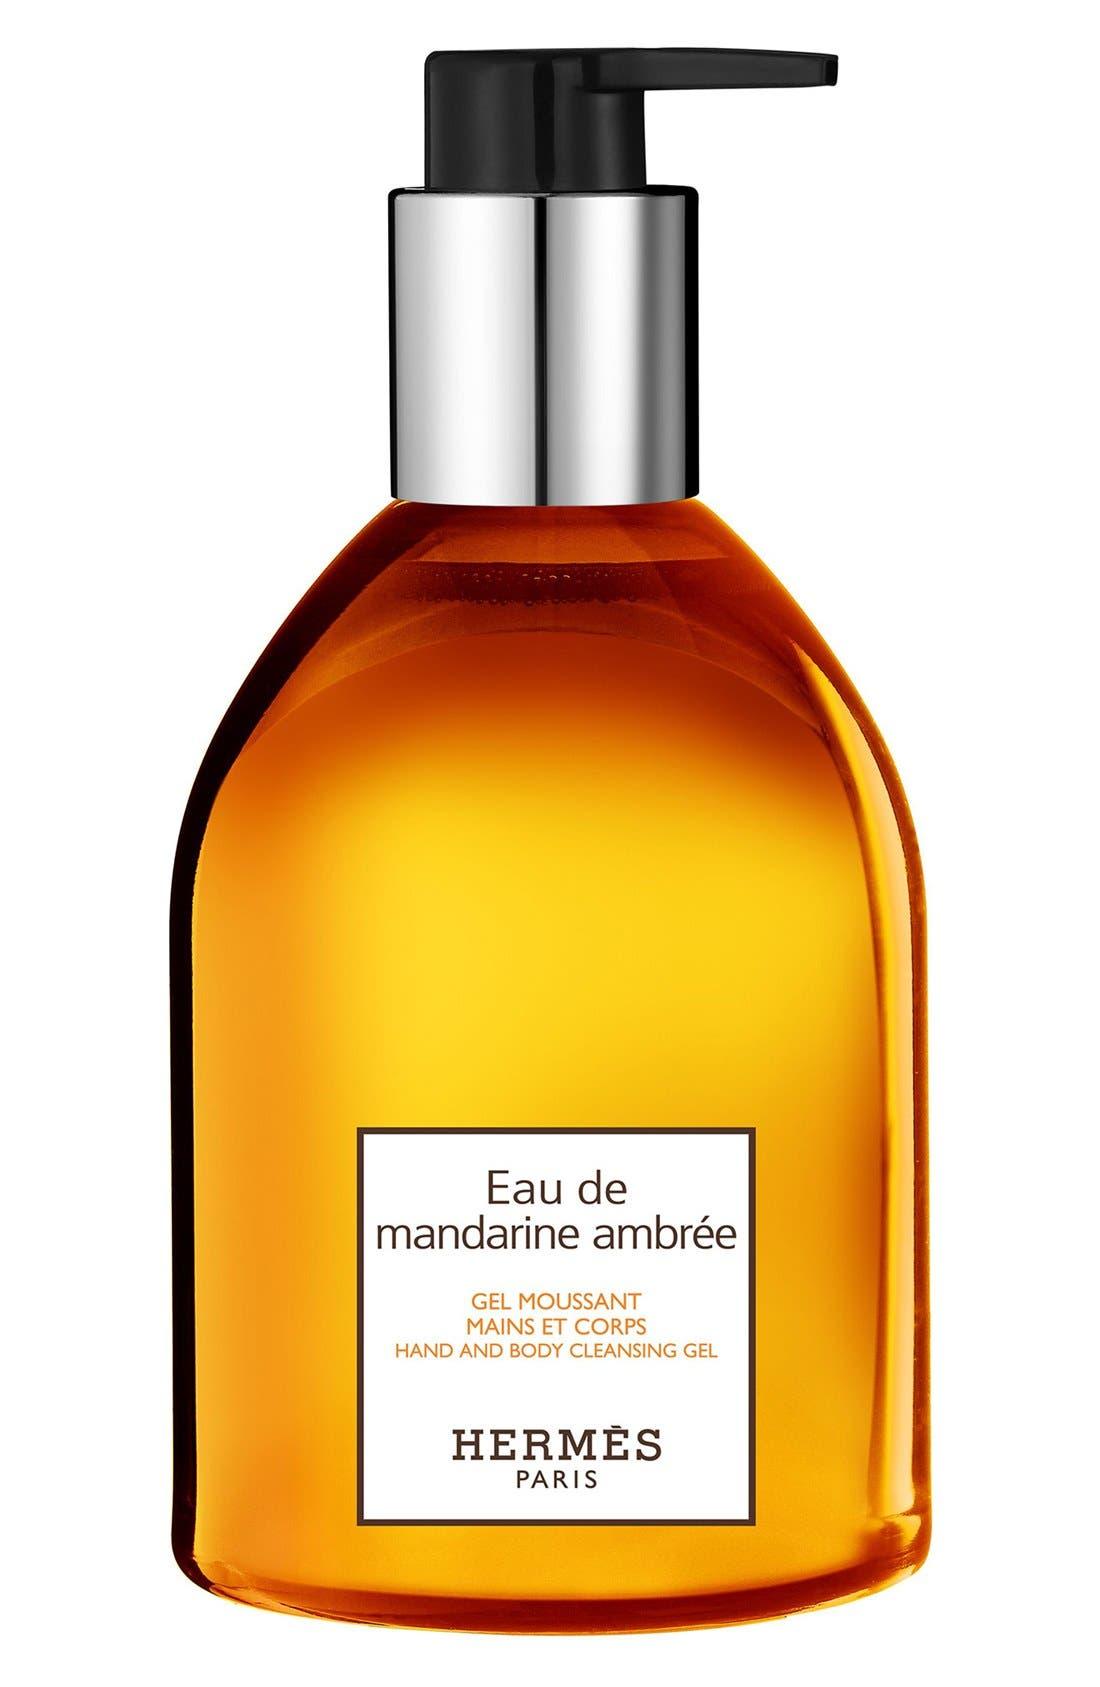 Hermès Eau de Mandarine Ambrée - Hand and body cleansing gel